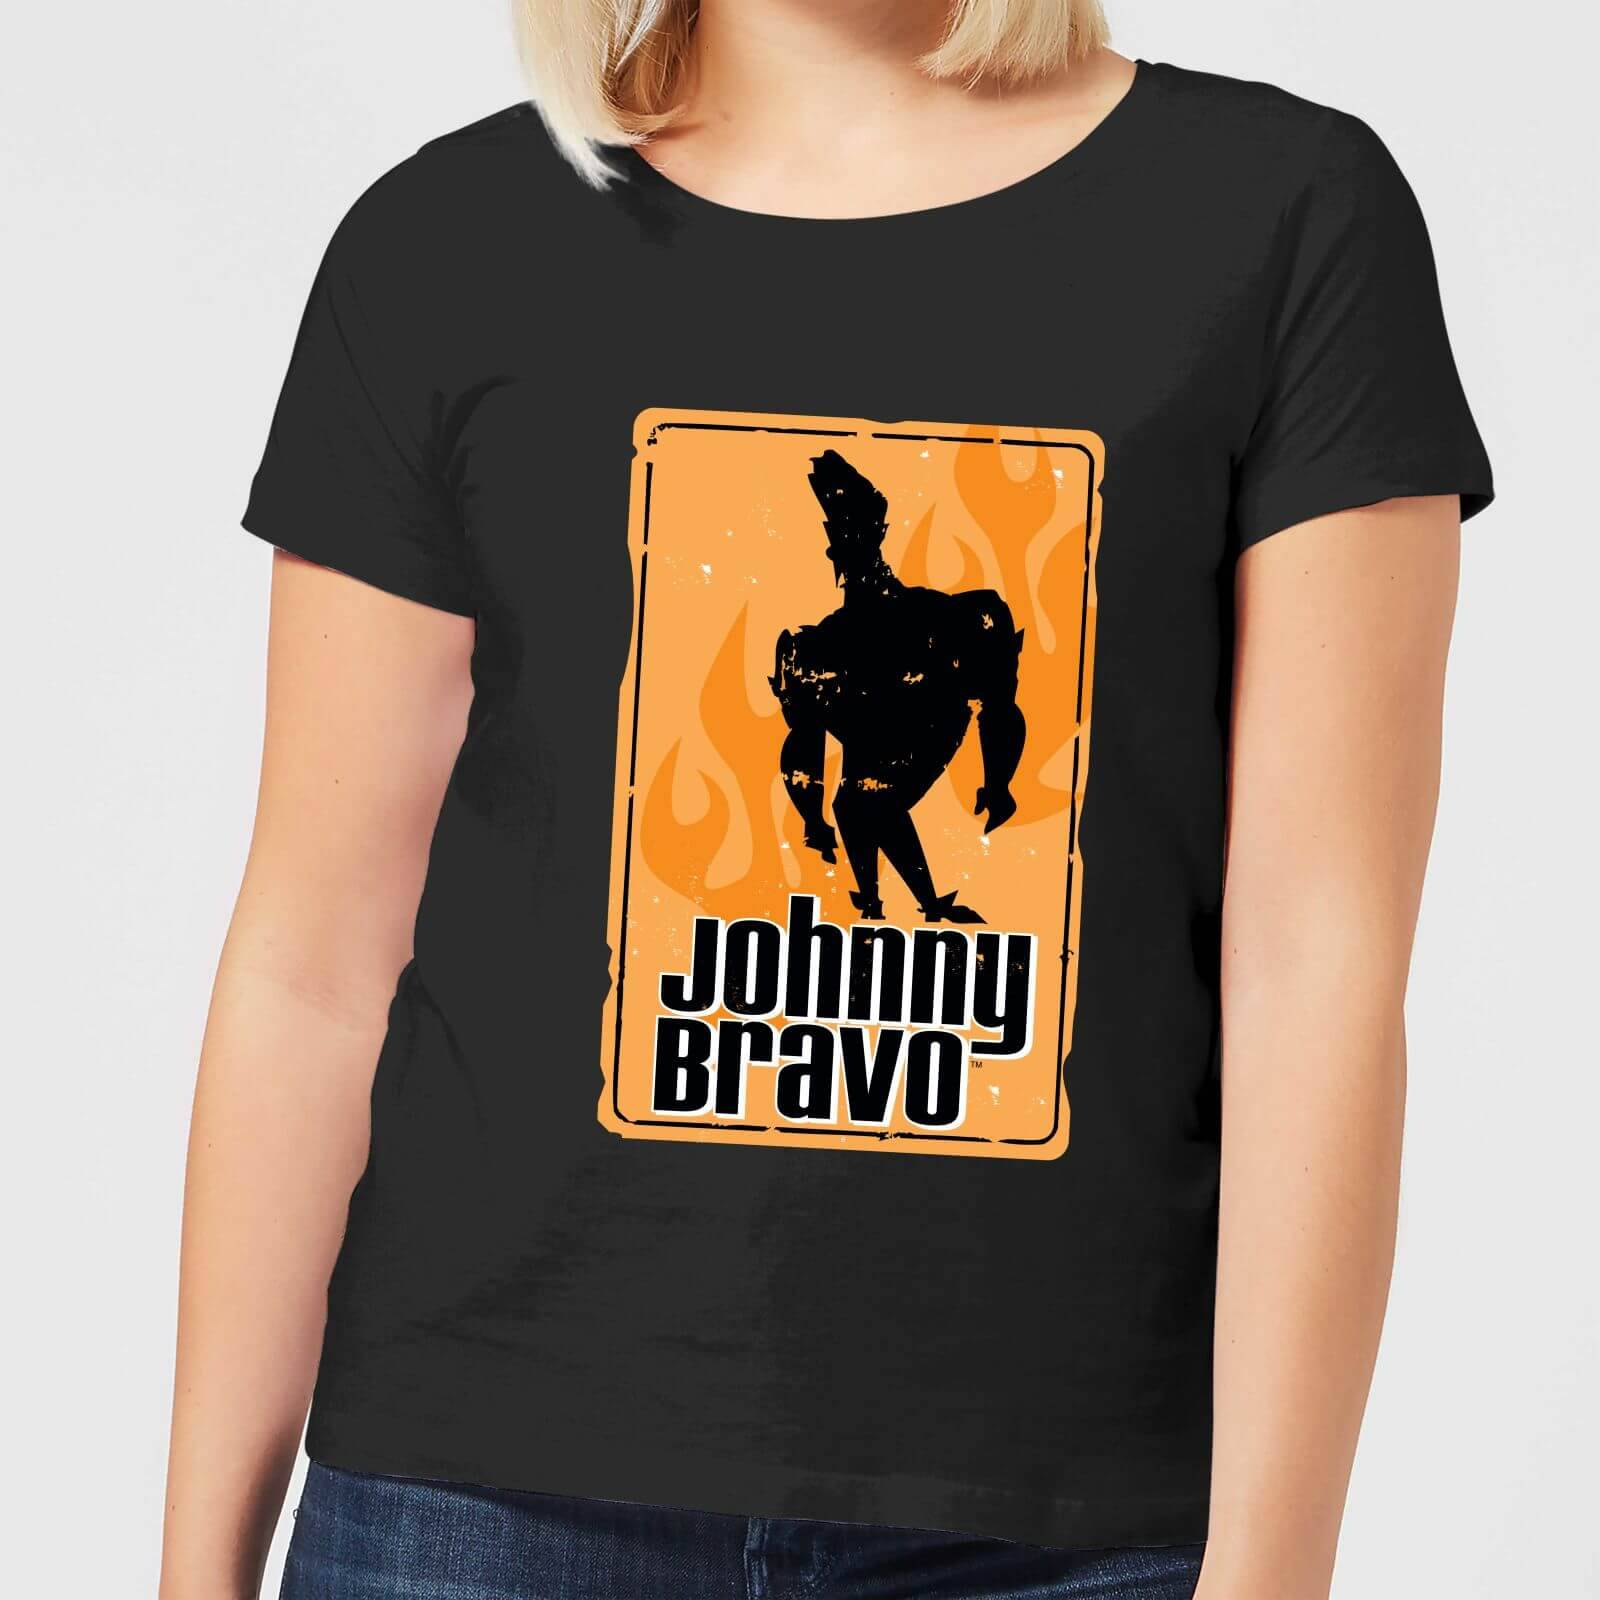 Cartoon Network Johnny Bravo Fire Women's T-Shirt - Black - M - Black